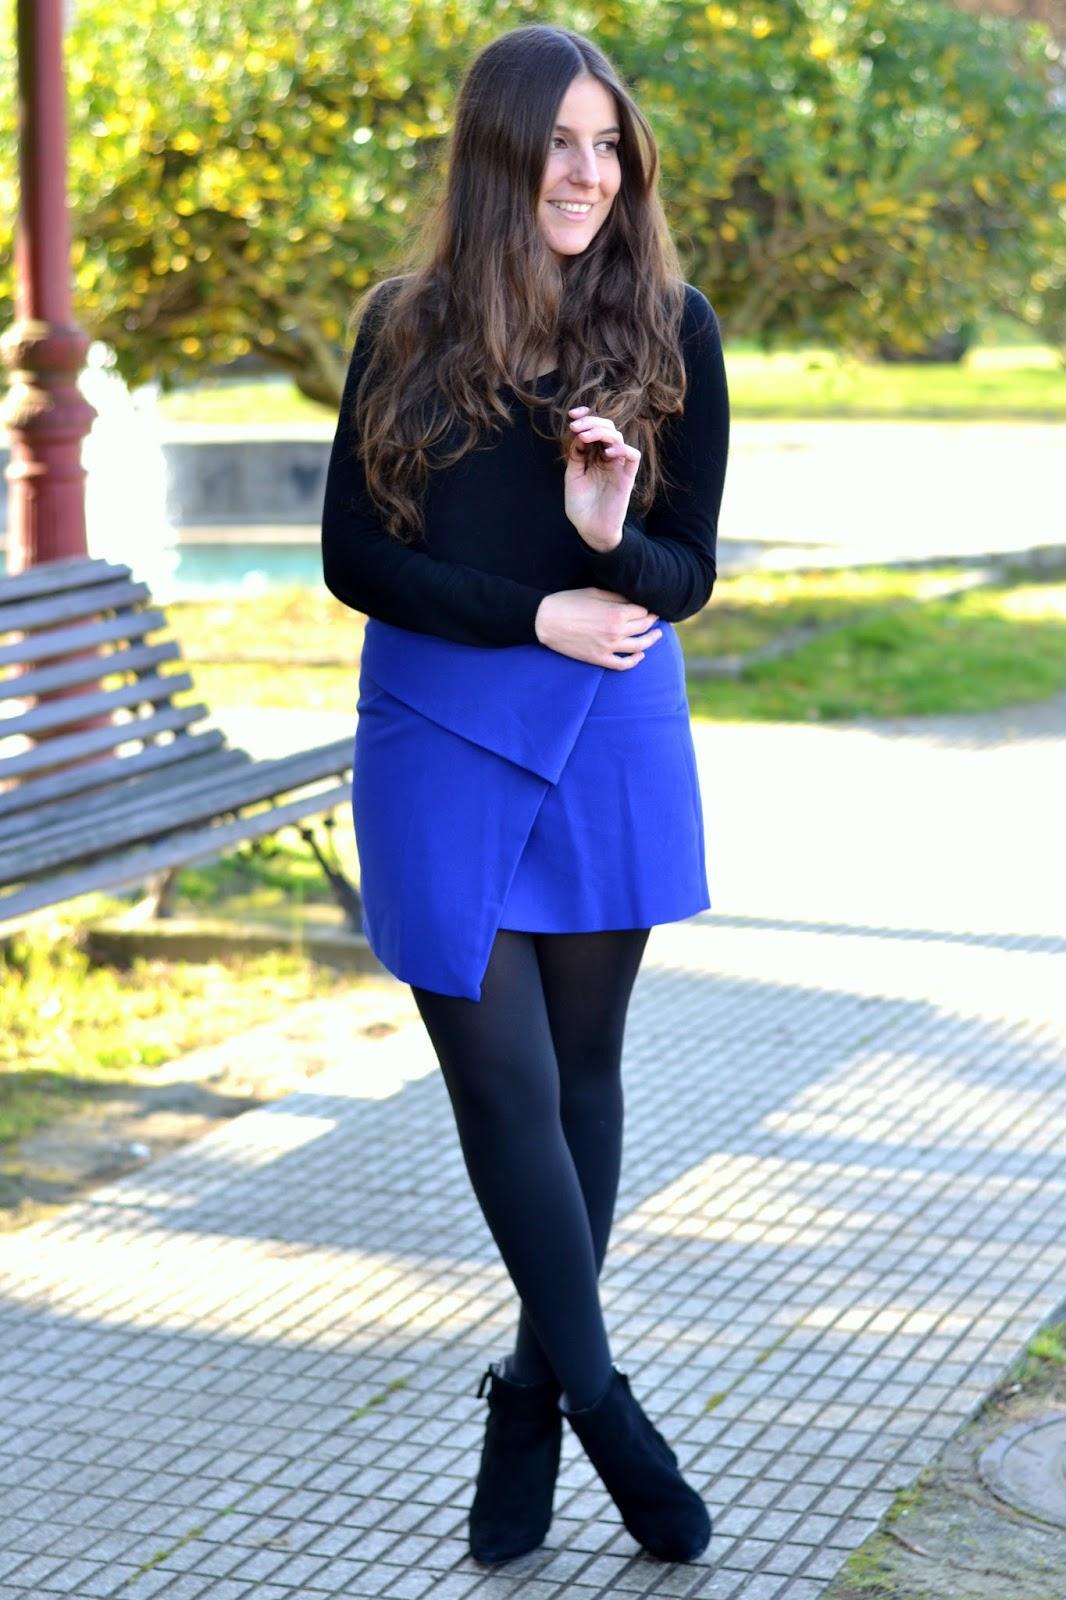 azul klein y negro